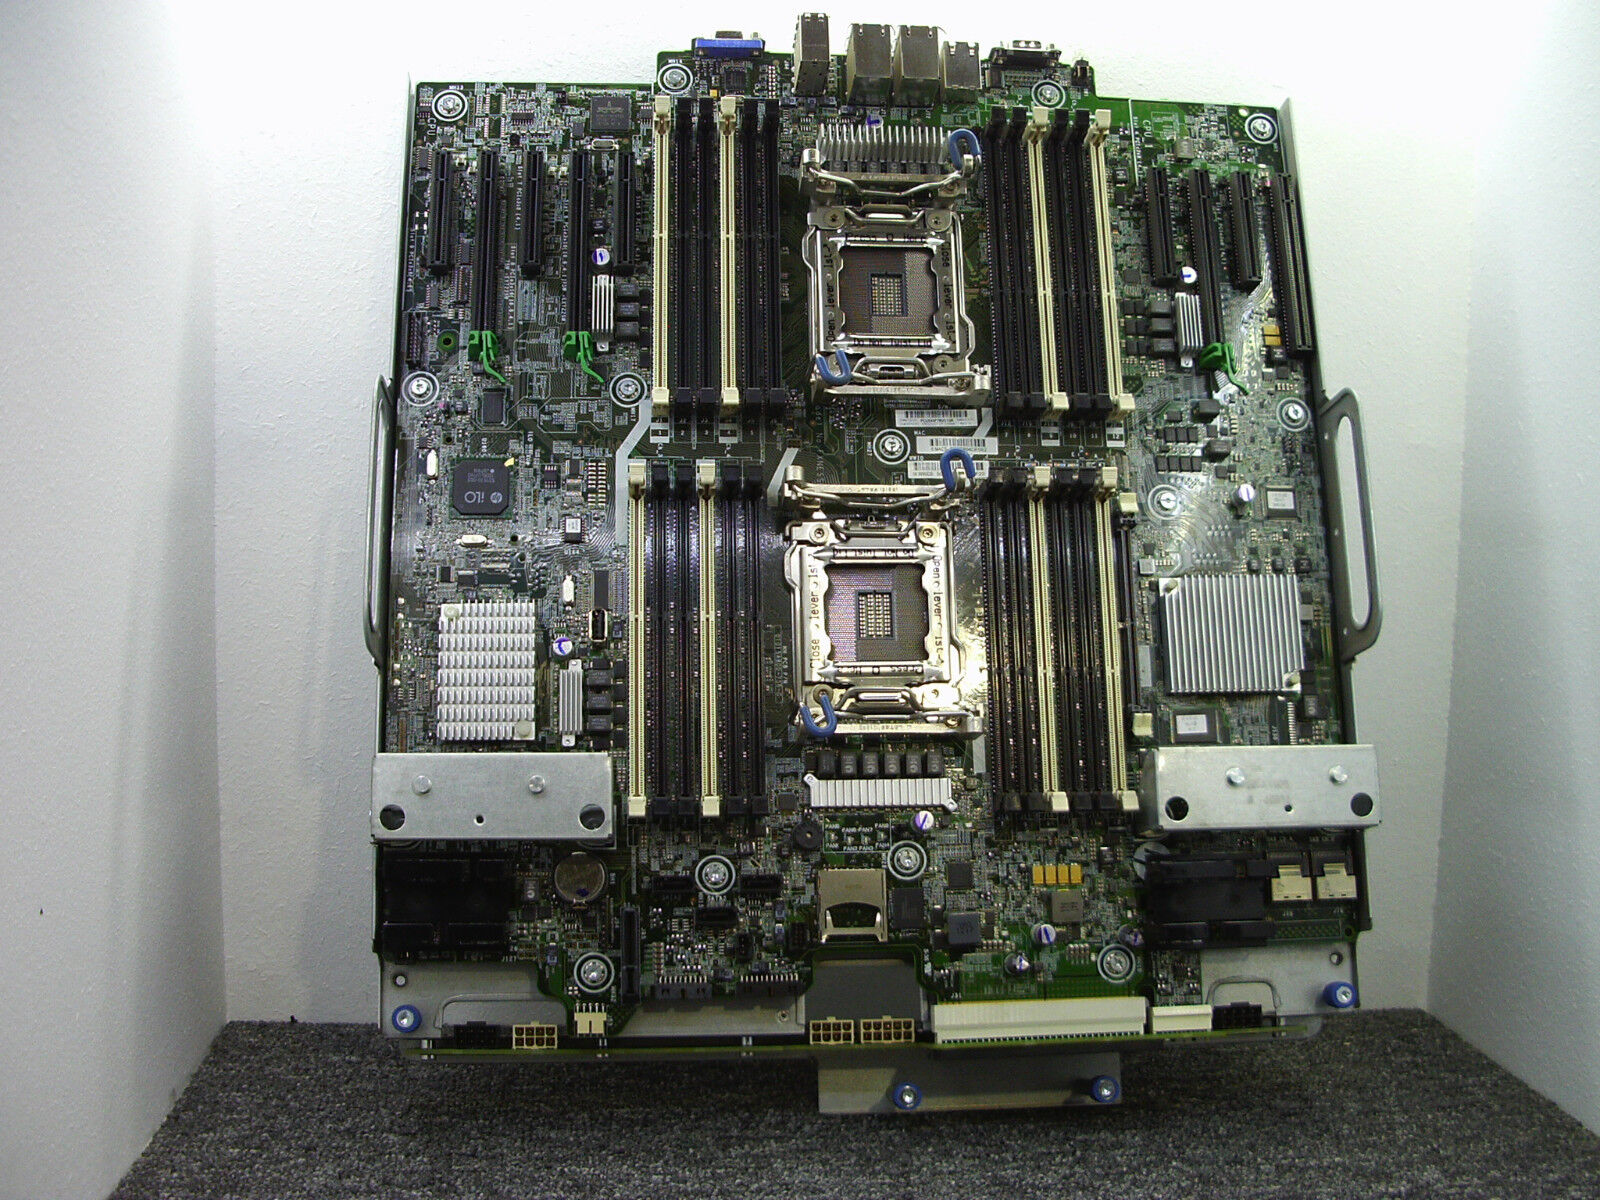 662530-001 681649-001 HP SYSTEM BOARD MOTHERBOARD FOR PROLIANT DL380p G8 GEN8